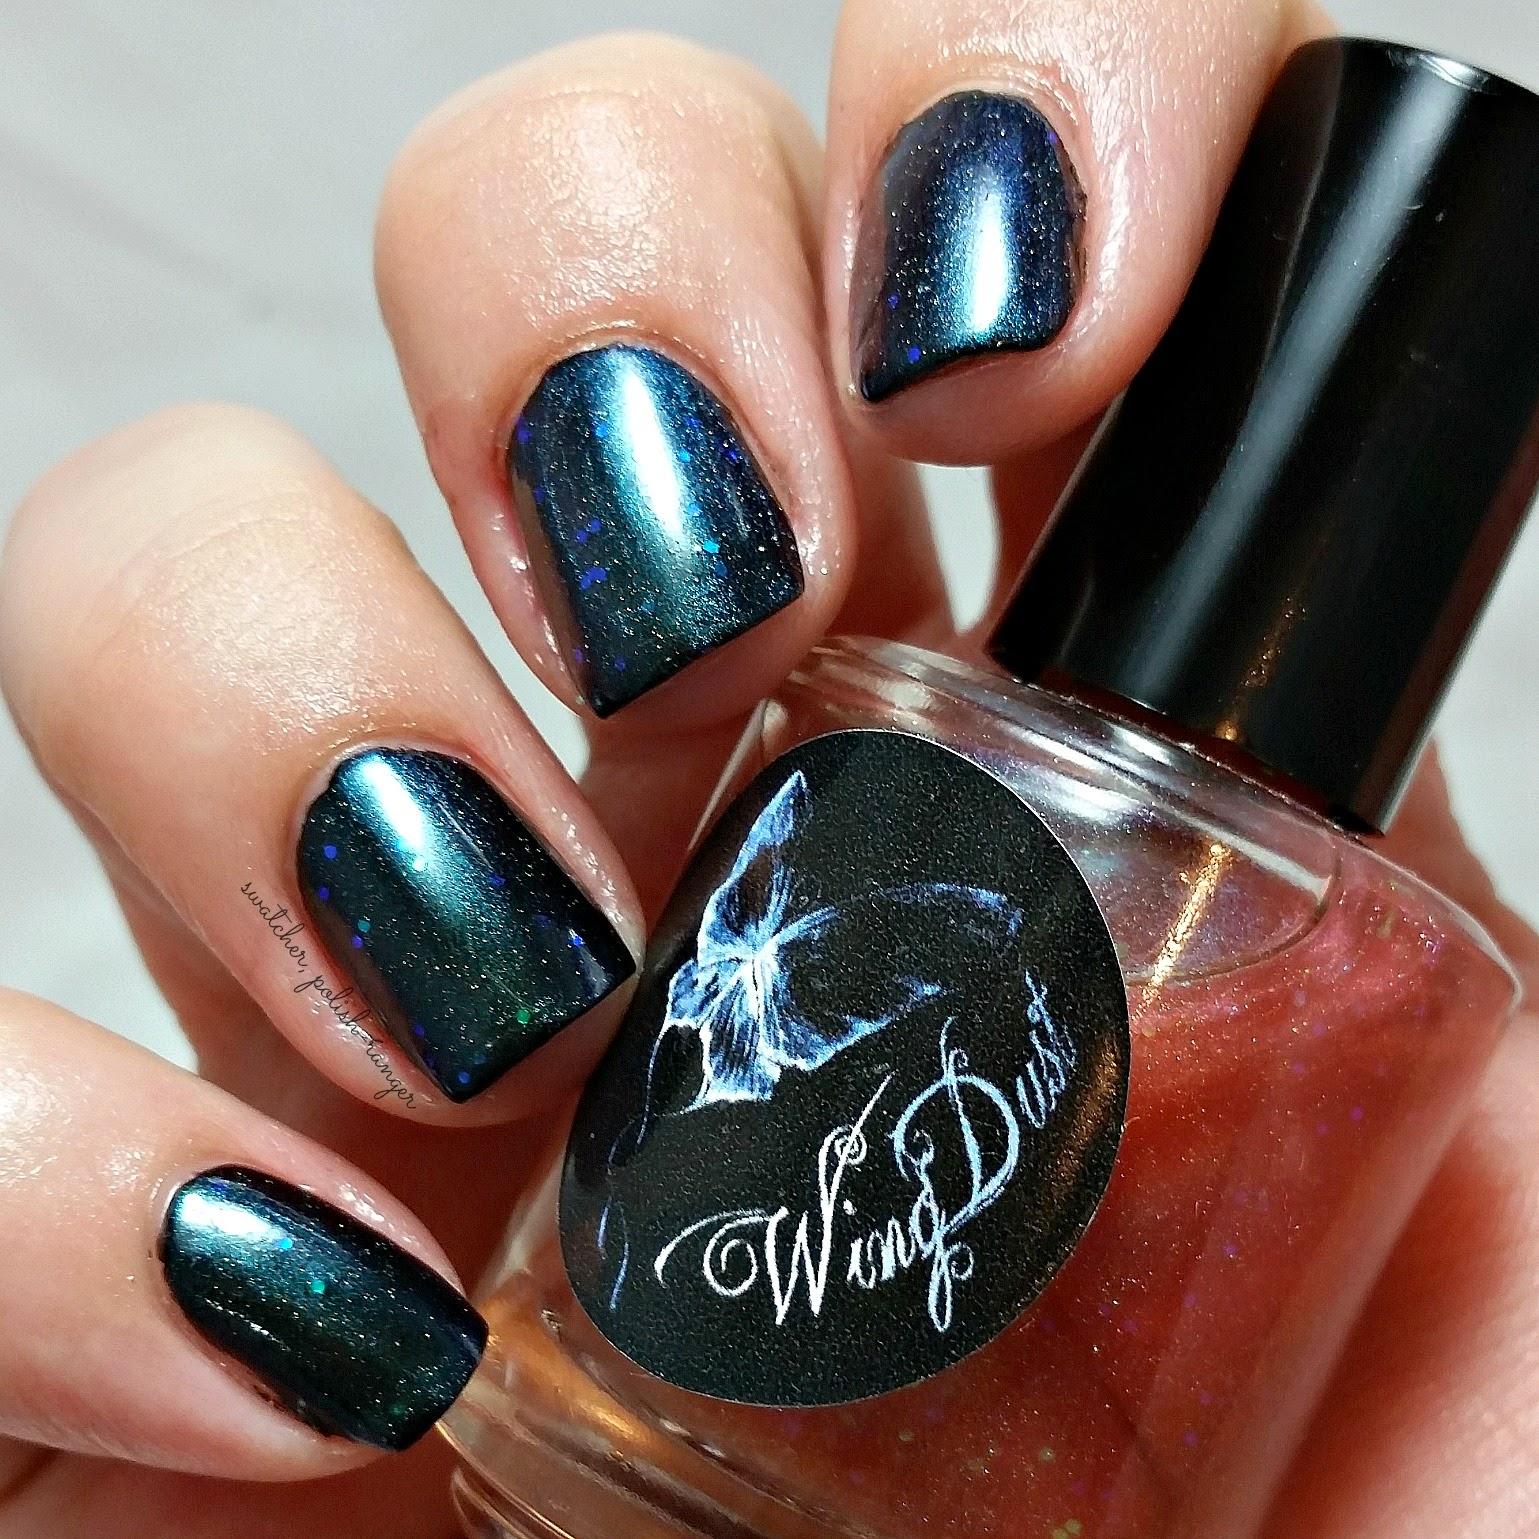 swatcher, polish-ranger | Wingdust Collections Aurora Sky swatch